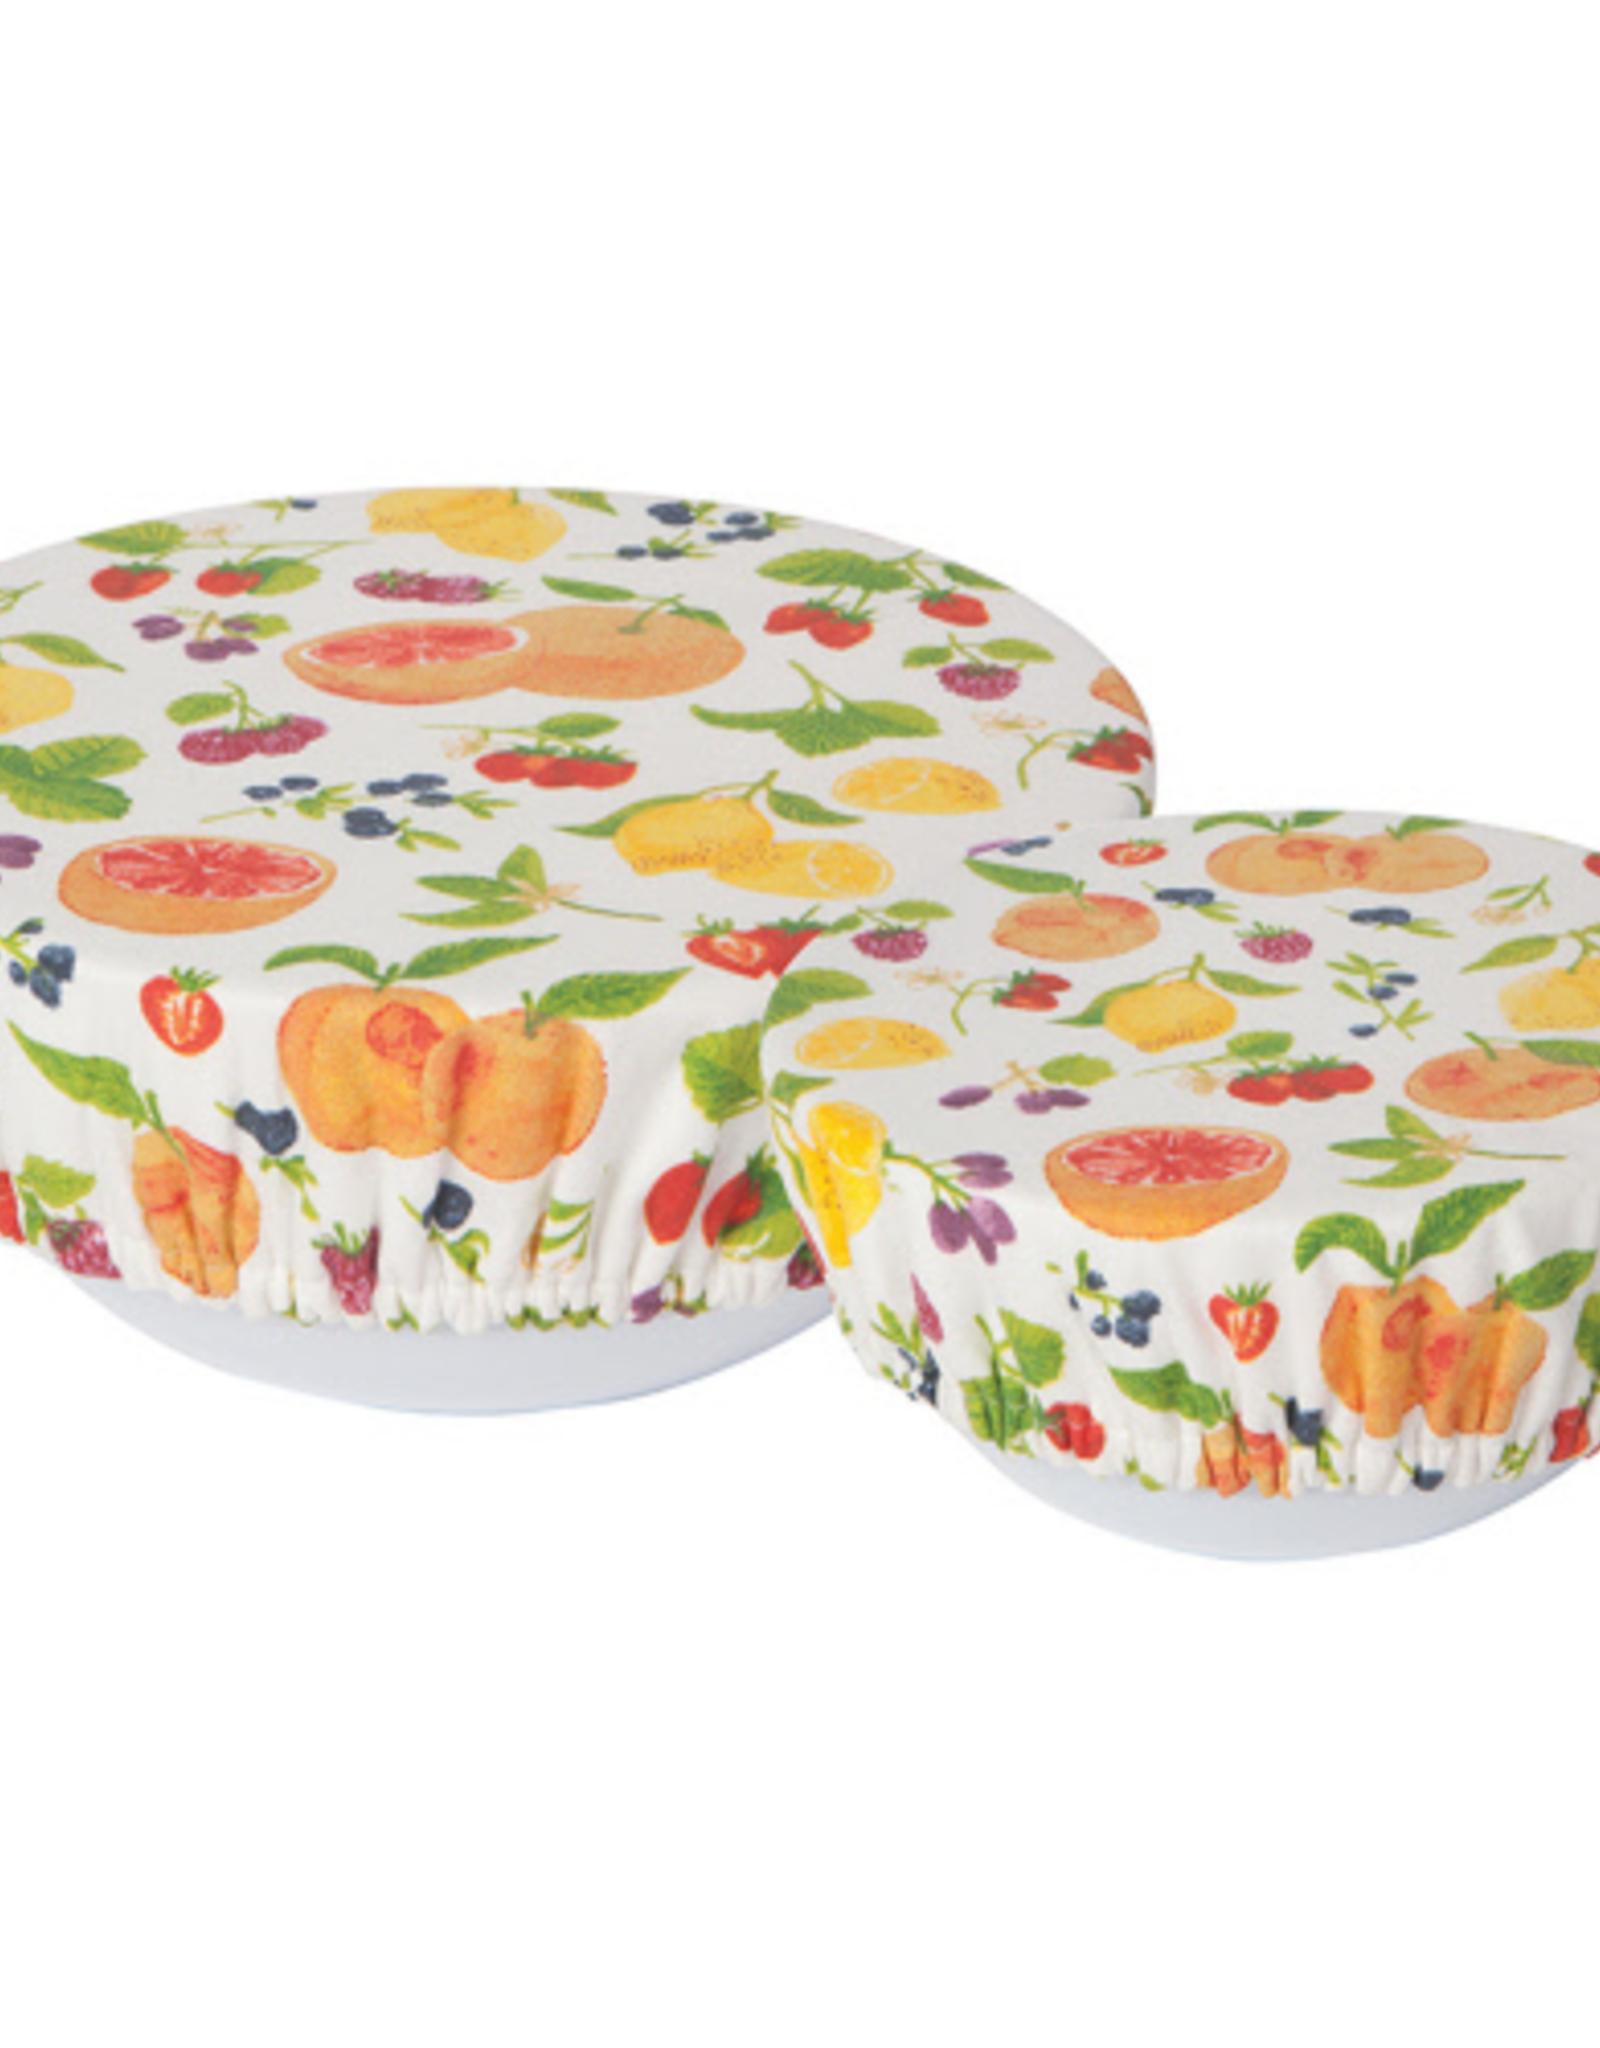 Danica Danica Bowl Cover-Fruit Salad Set 2